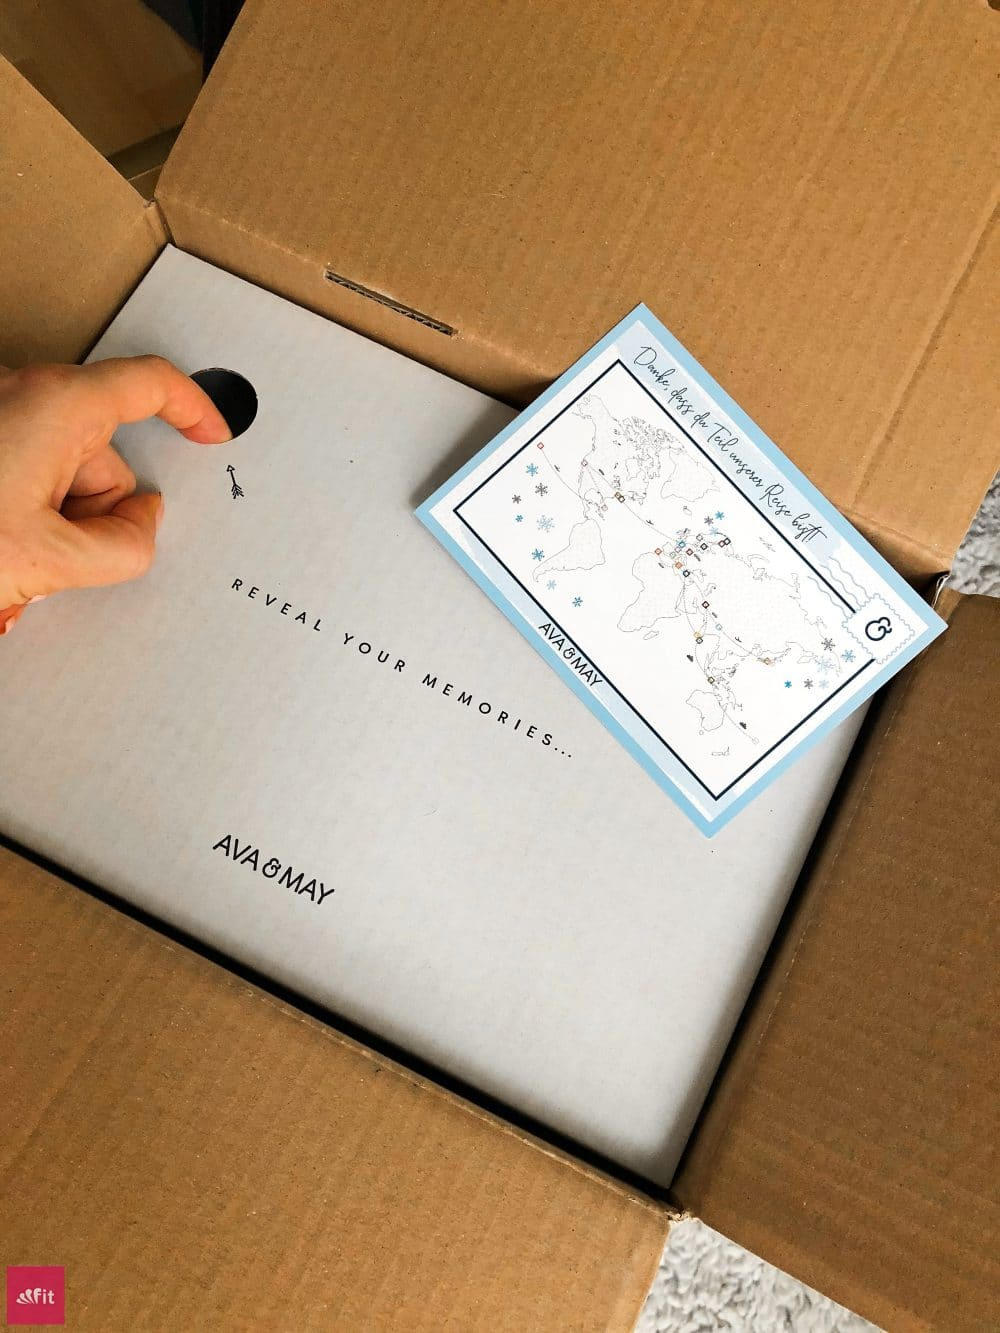 Duftkerzen Ava and May Verpackung Lieferung Versand